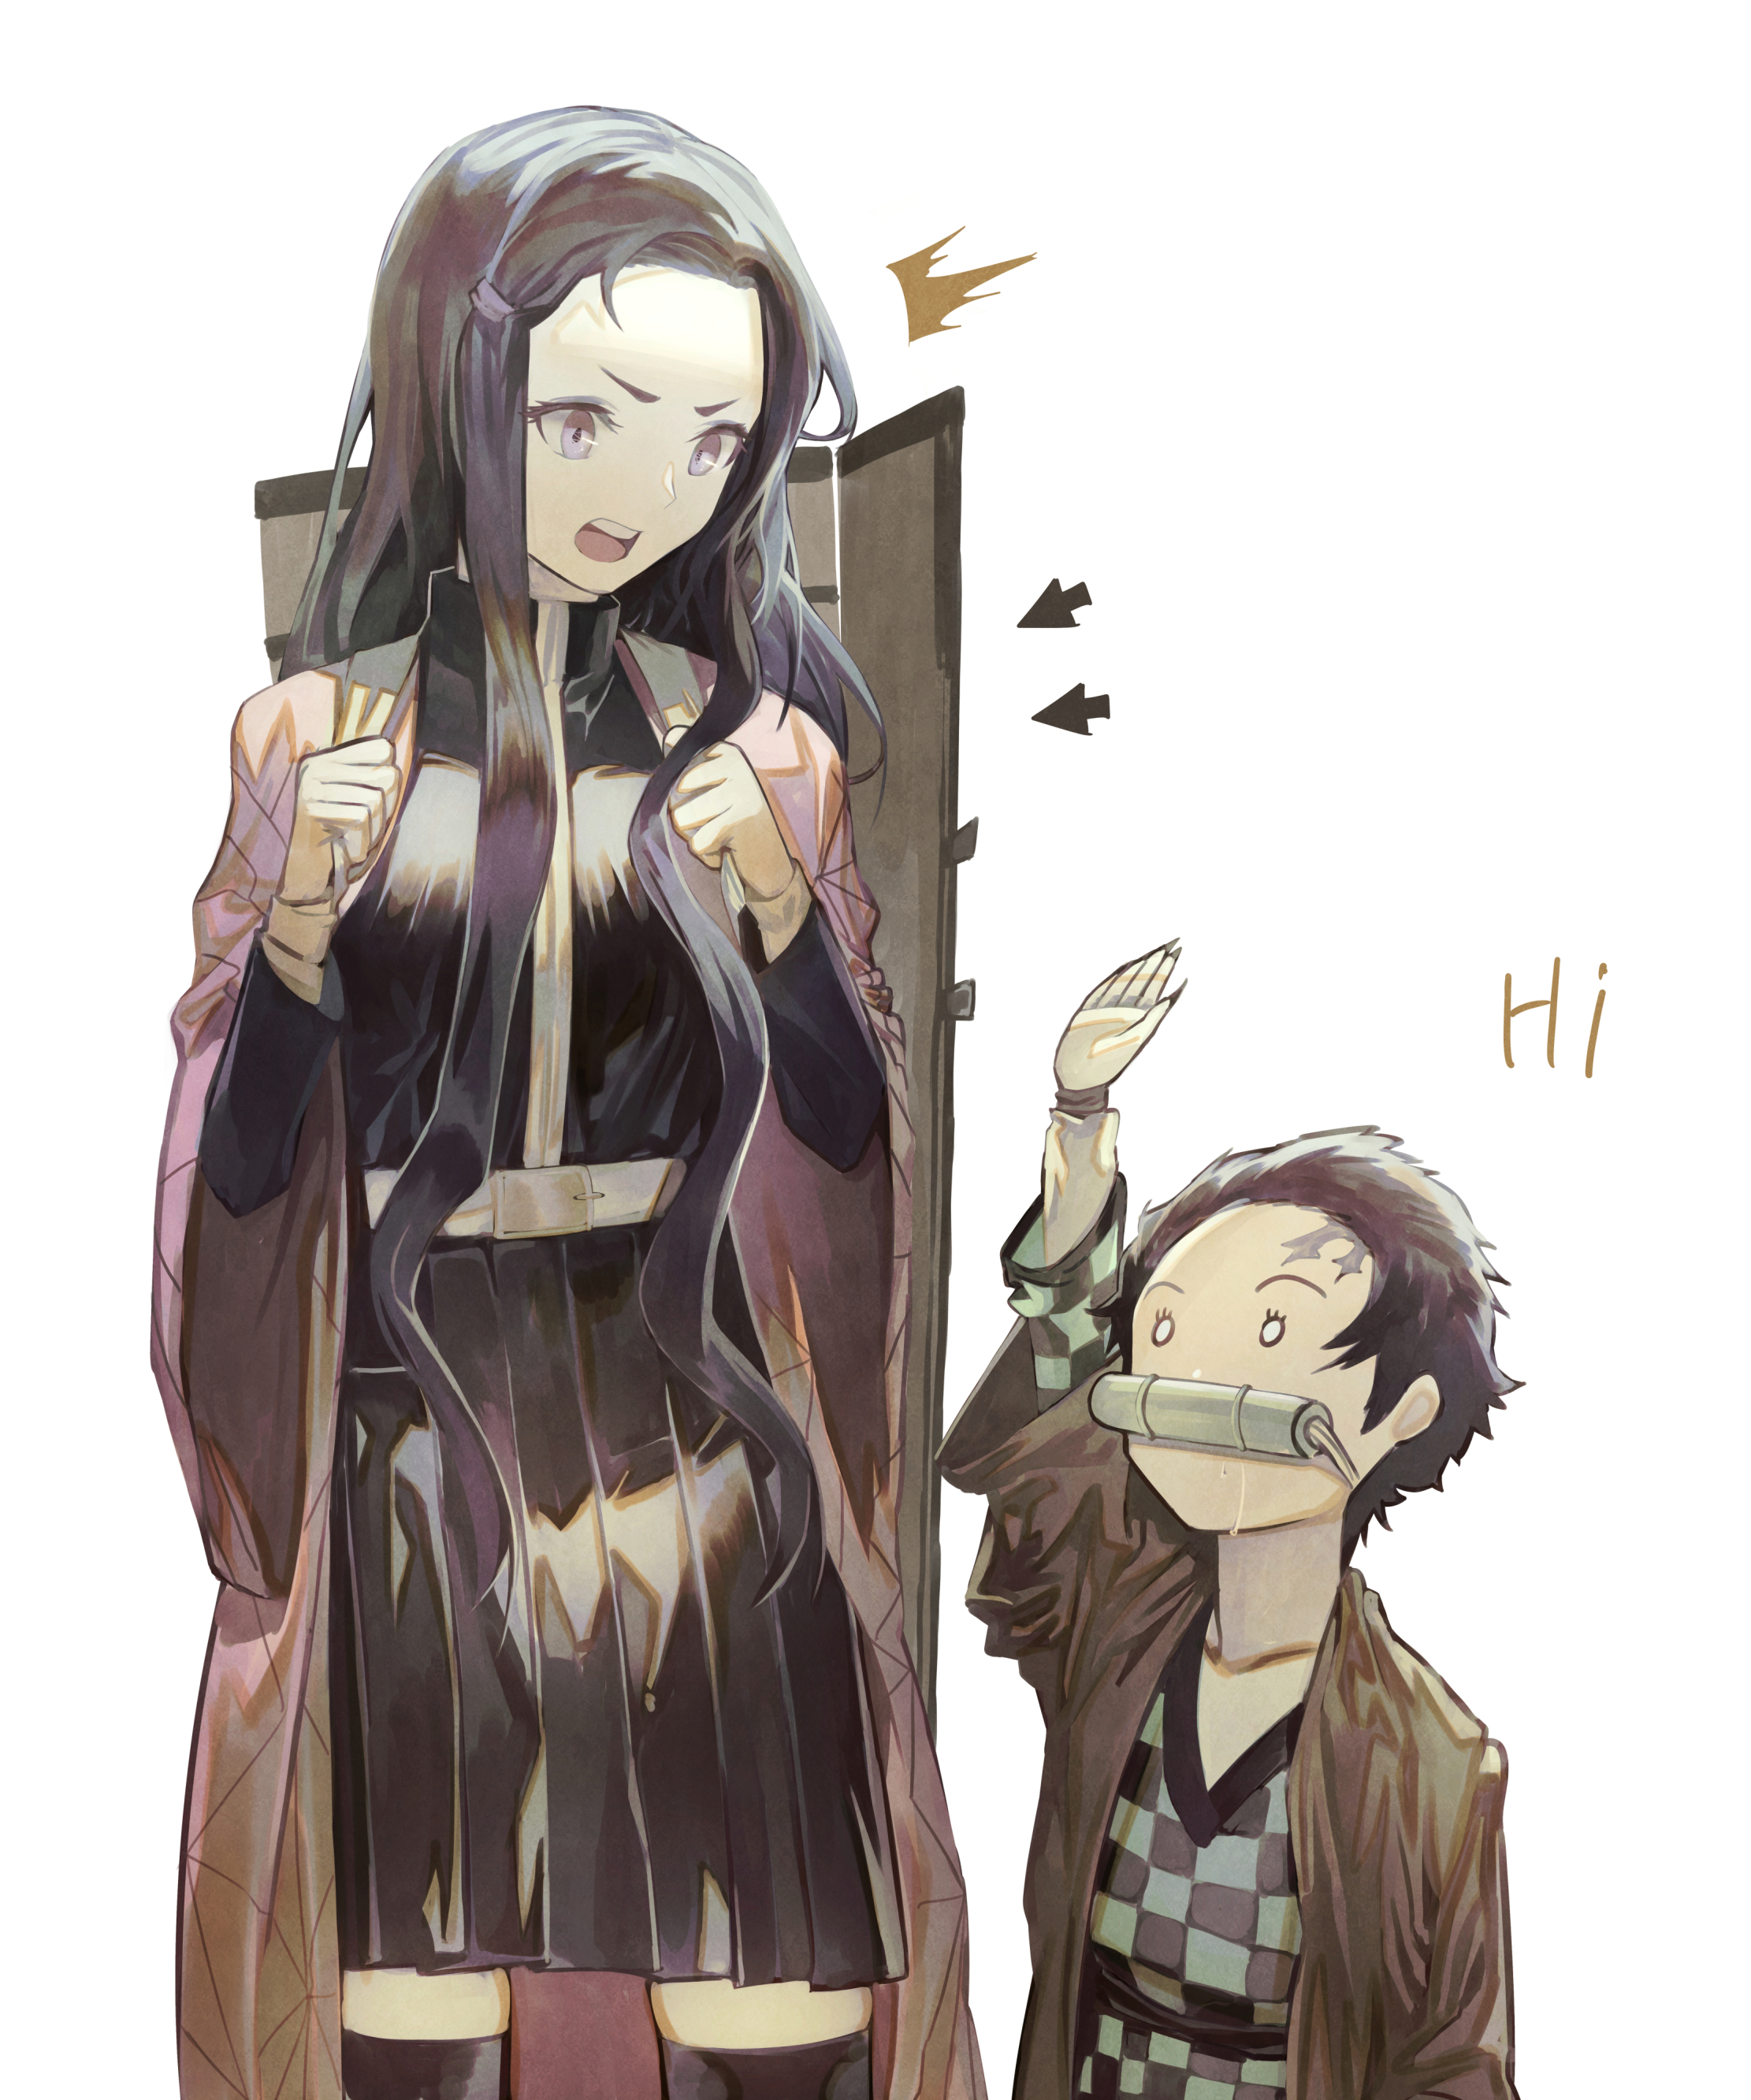 Anime 2222x2665 Kimetsu no Yaiba black hair long hair bamboo 2D fan art vertical drool simple background Kamado Nezuko Kamado Tanjirō